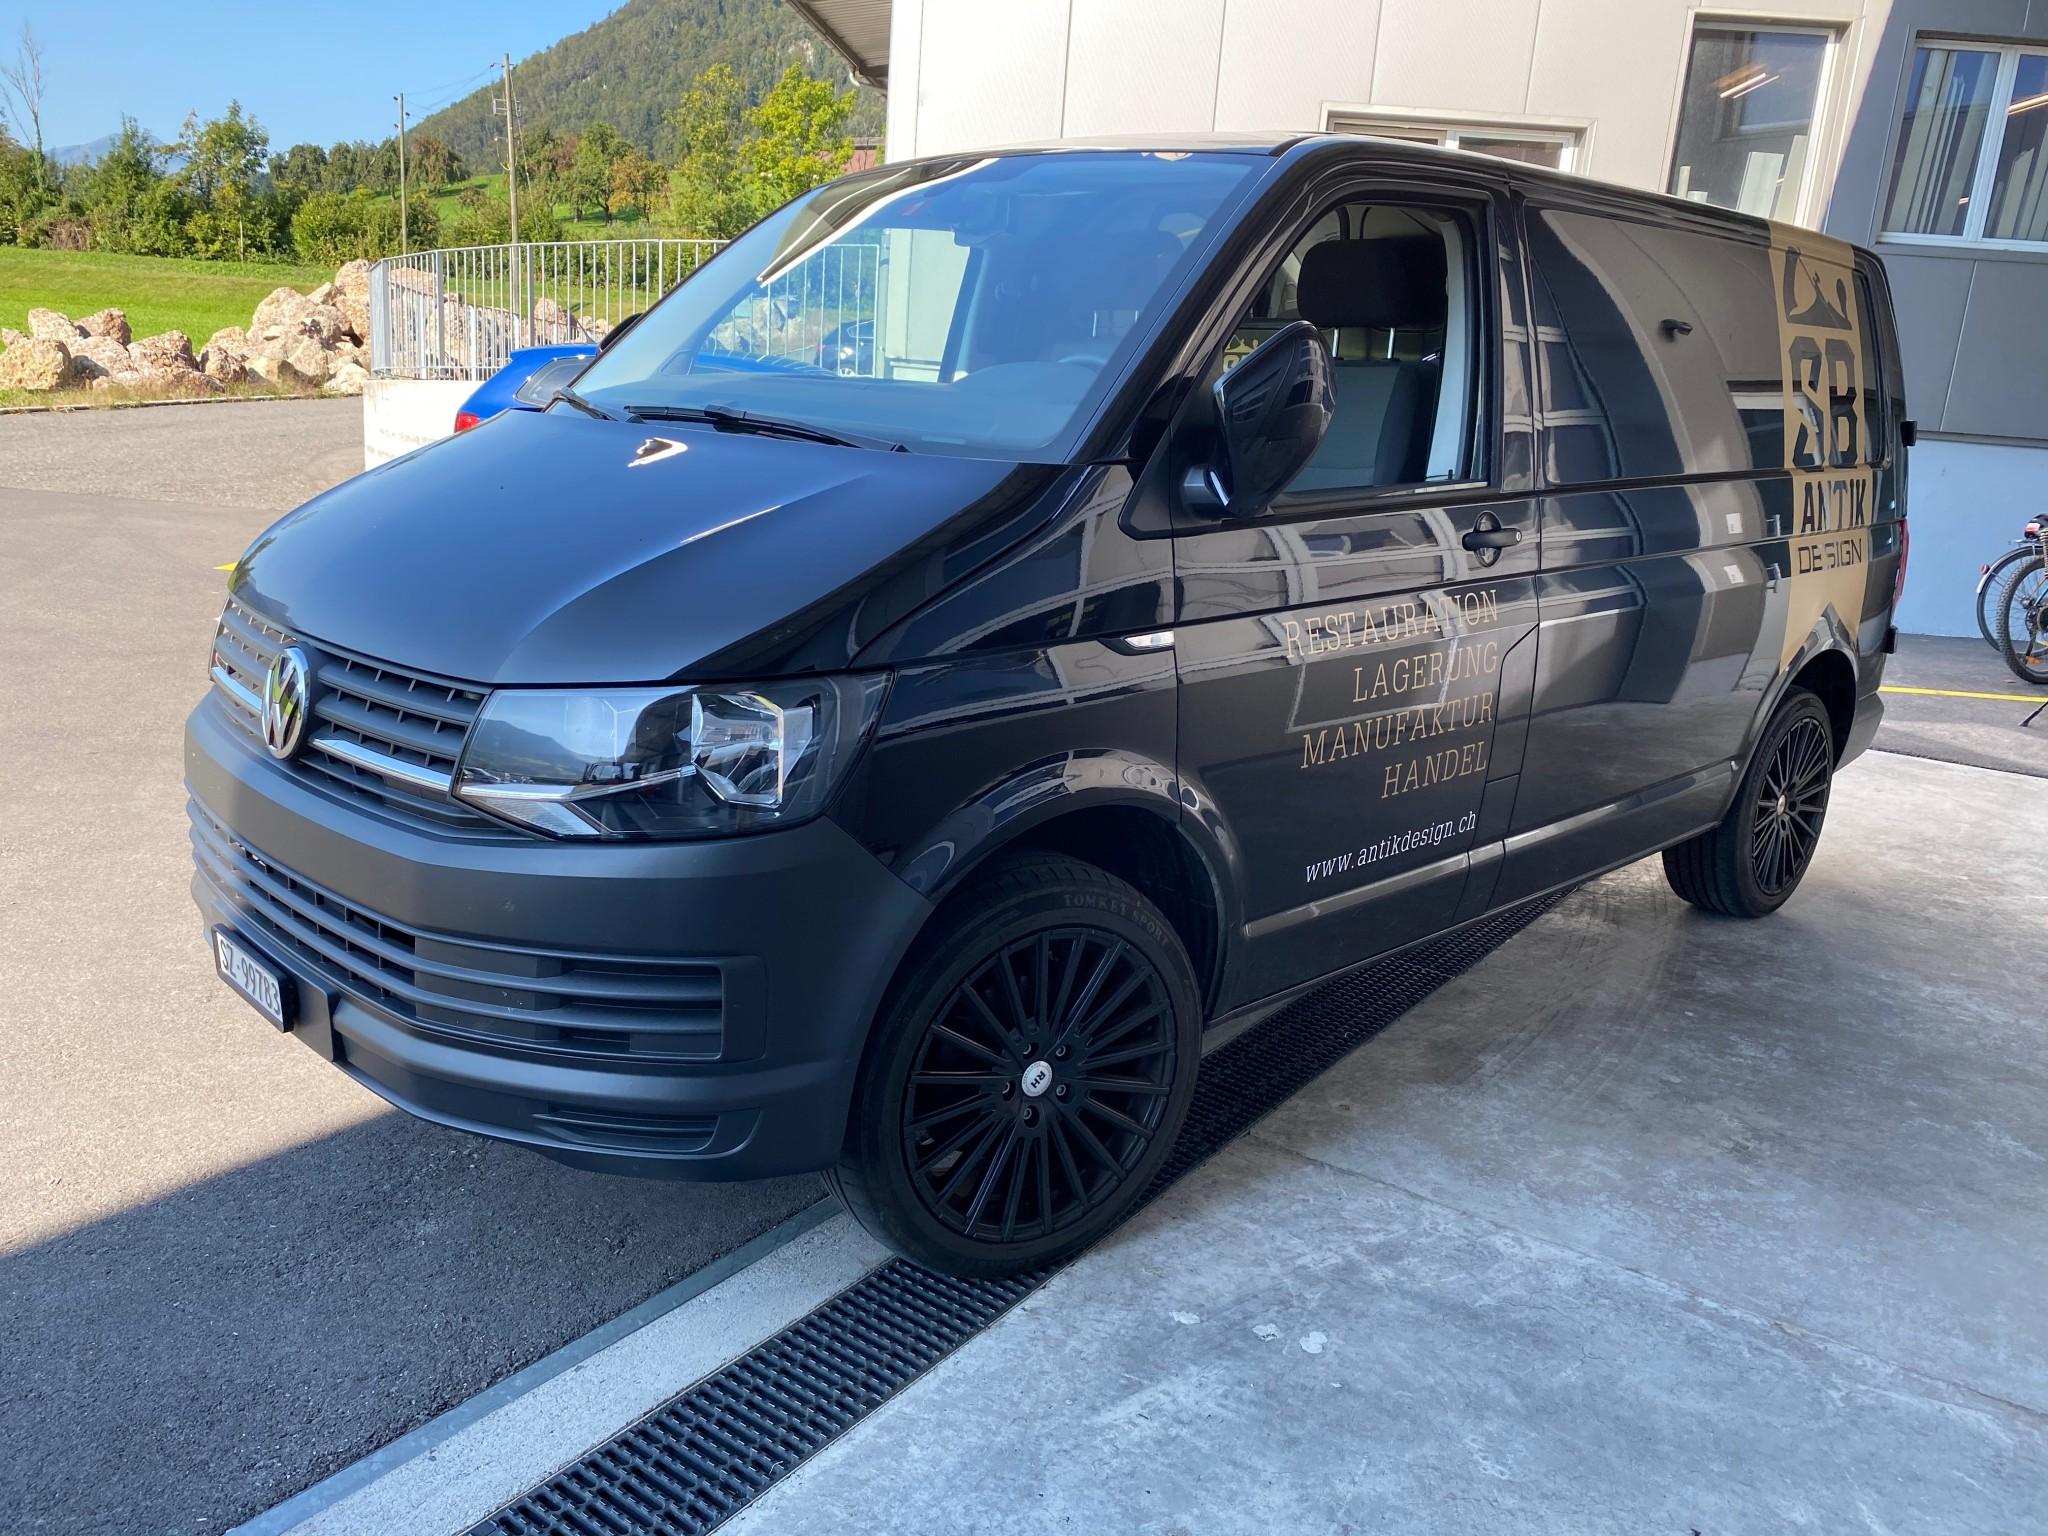 Buy Van Vw T6 Transporter Schwarz 4x4 Anhangerkupplung 75000 Km At 26500 Chf On Carforyou Ch